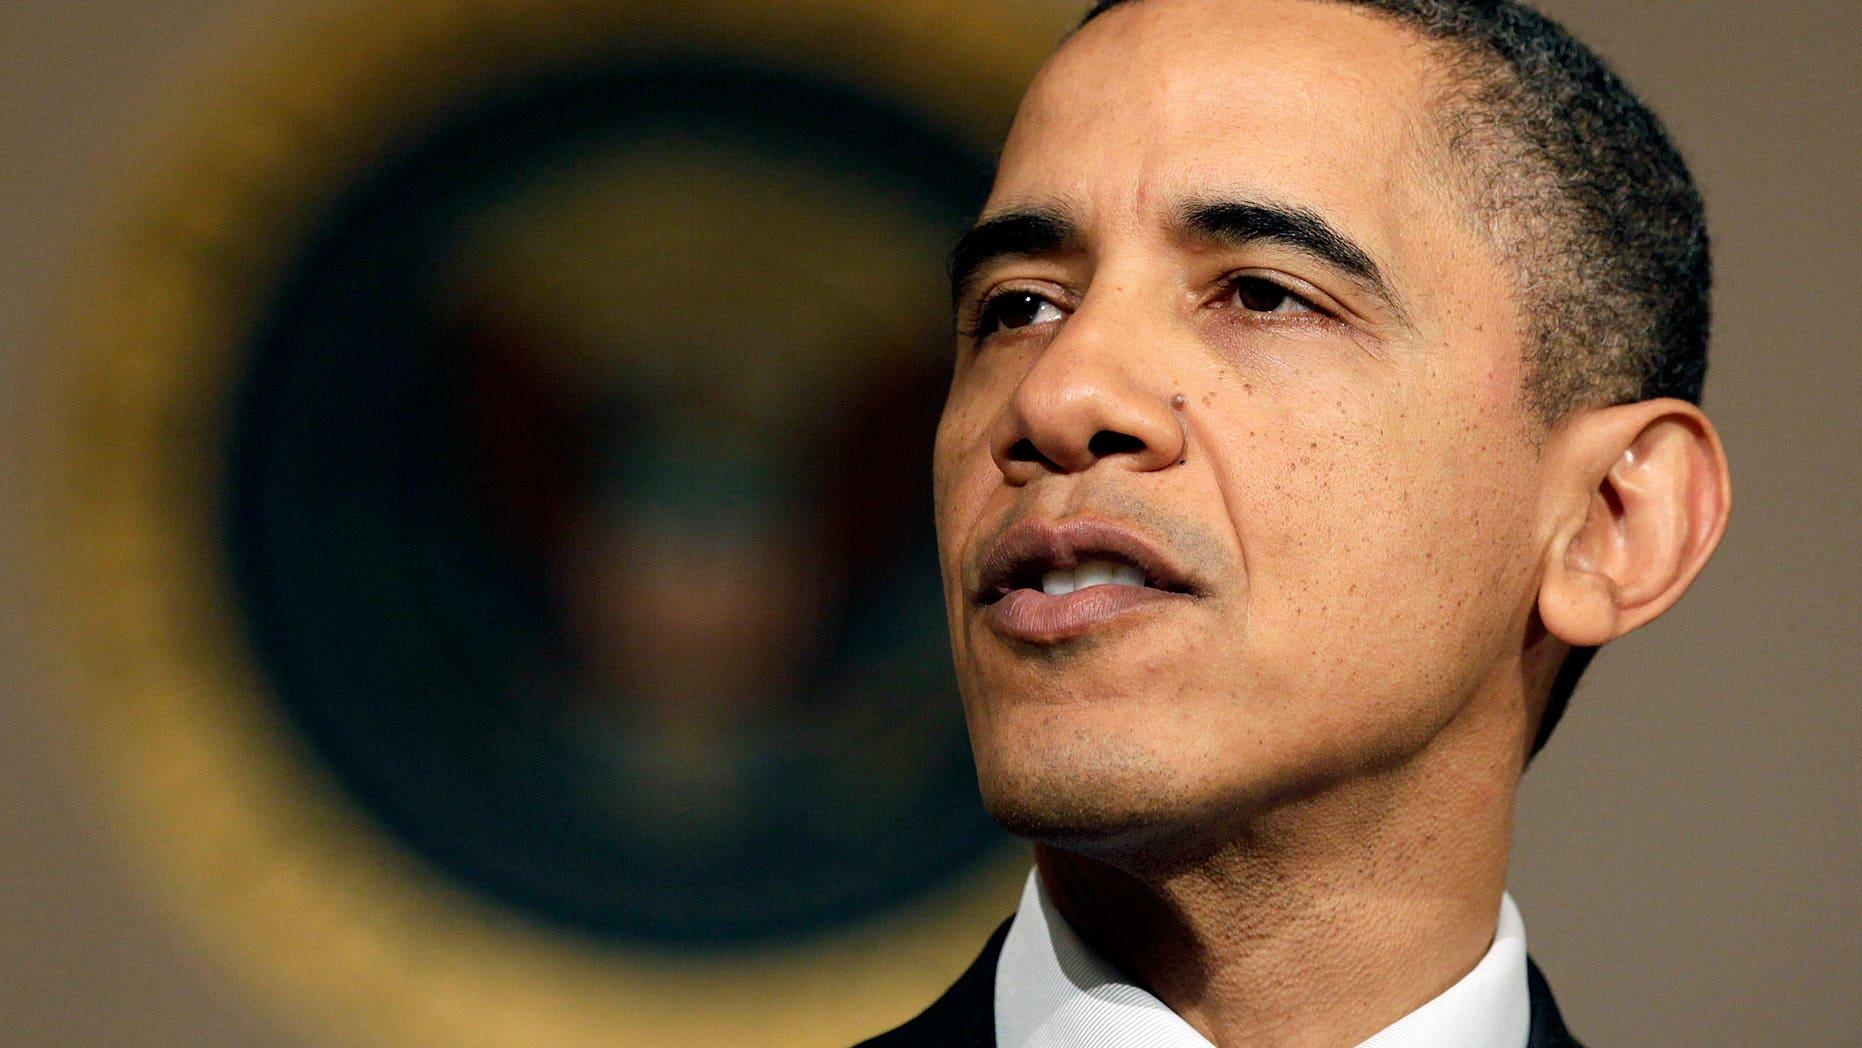 President Barack Obama makes a statement on the resignation of Egypt's President Hosni Mubarak in the Grand Foyer at the White House in Washington, Friday, Feb. 11, 2011. (AP)